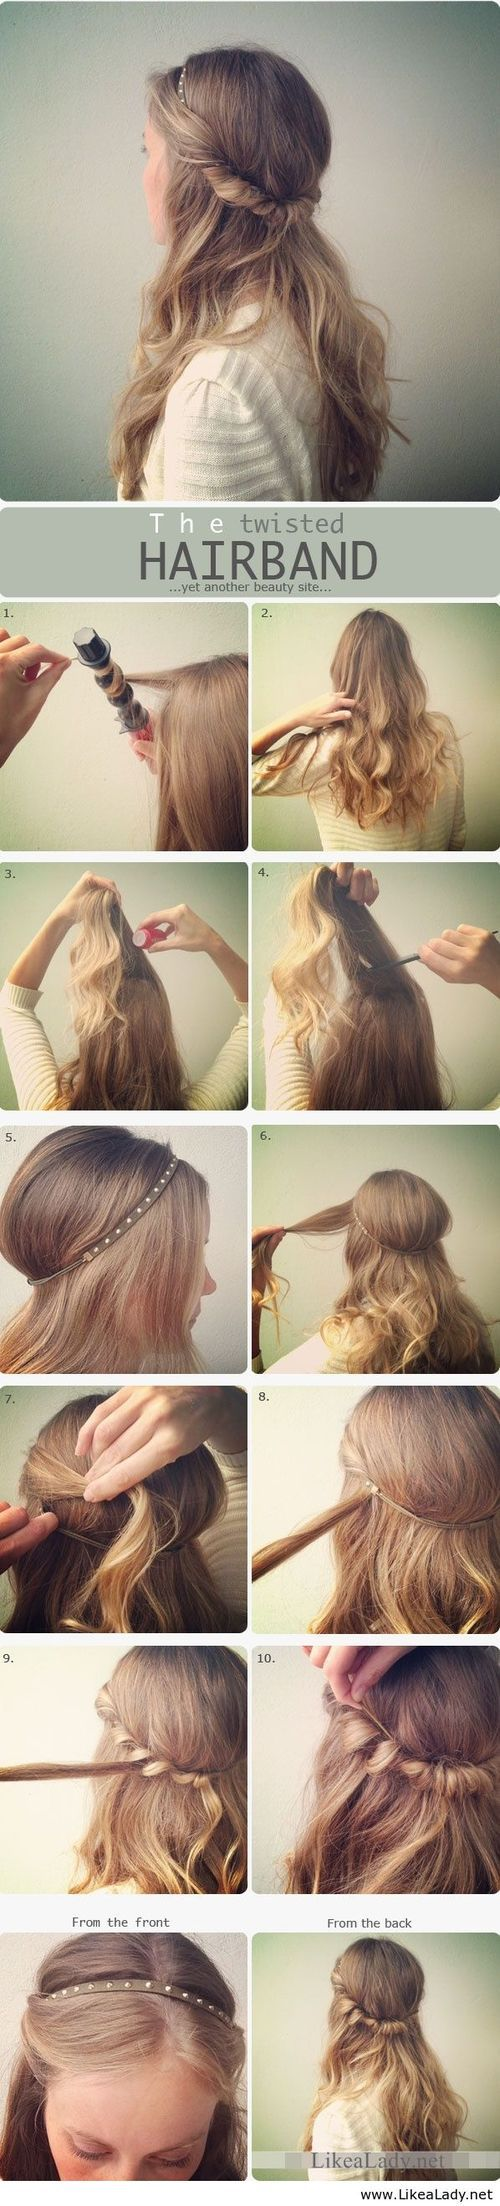 The twisted hairband [ OilsNetwork.com ] #beauty #health #wealth